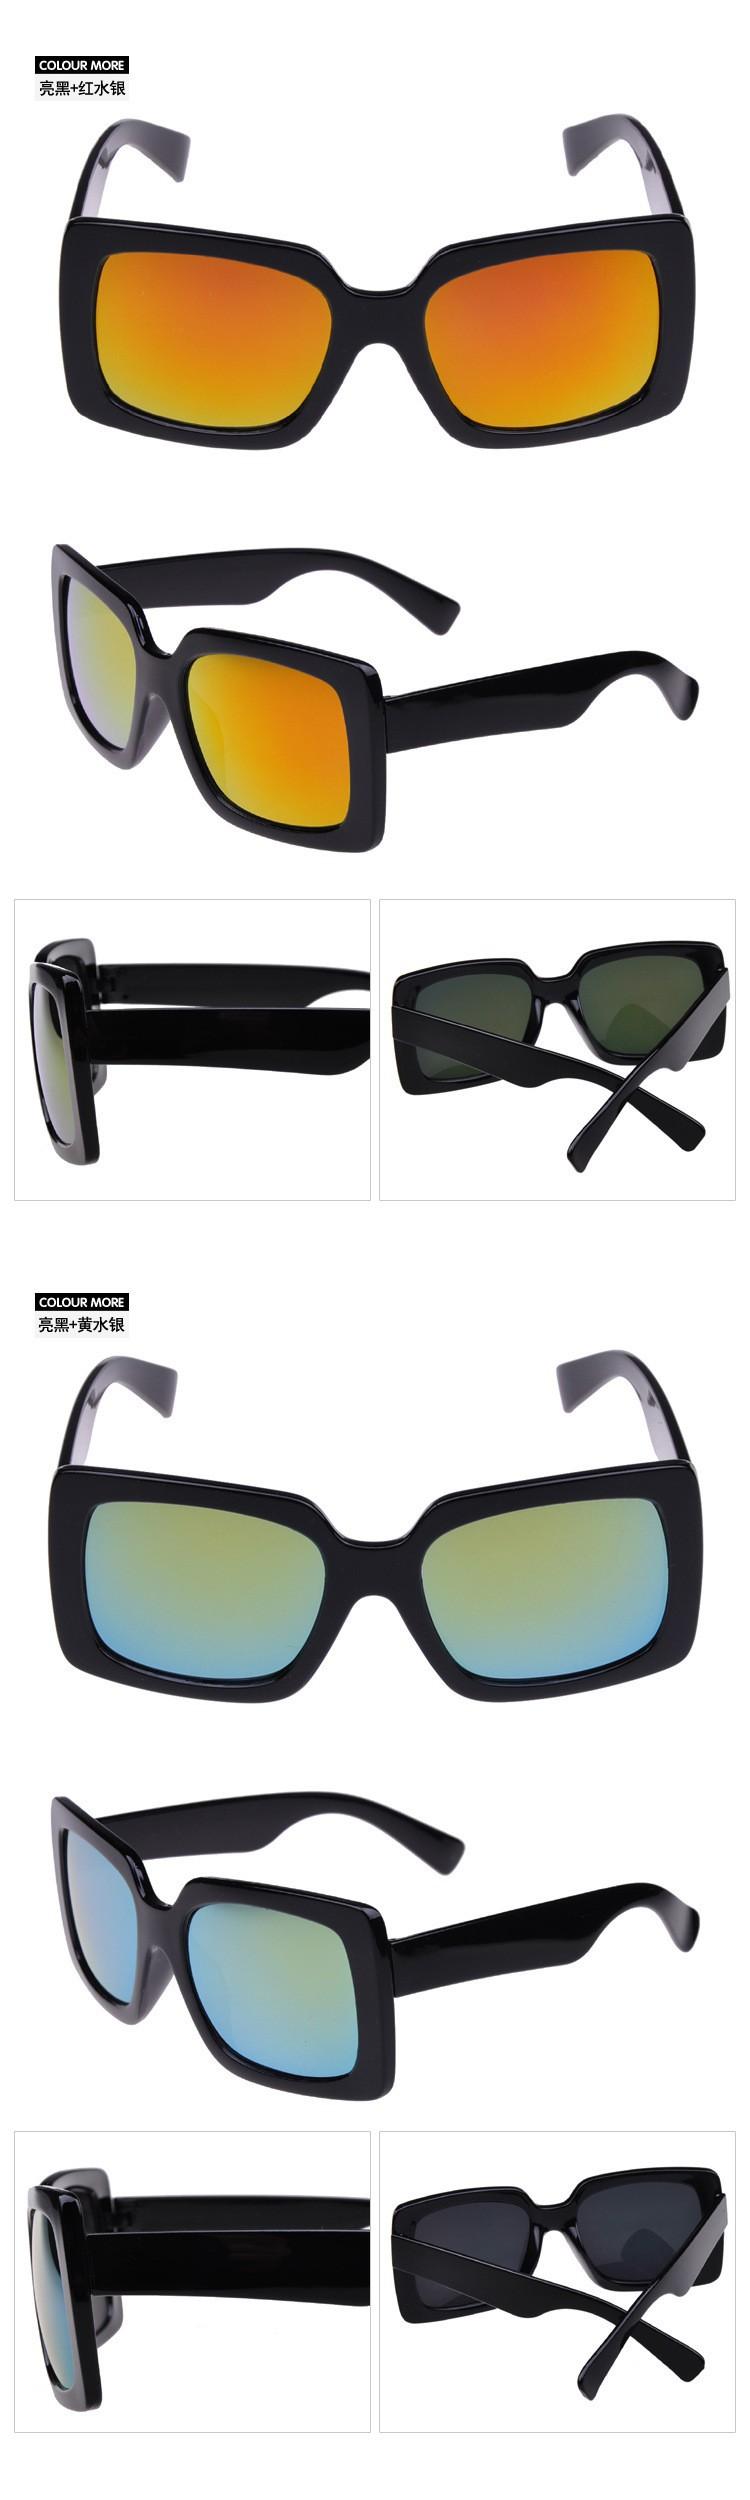 Men Women Sunglasses 2015 New Square Vintage Style Glasses Oculos De